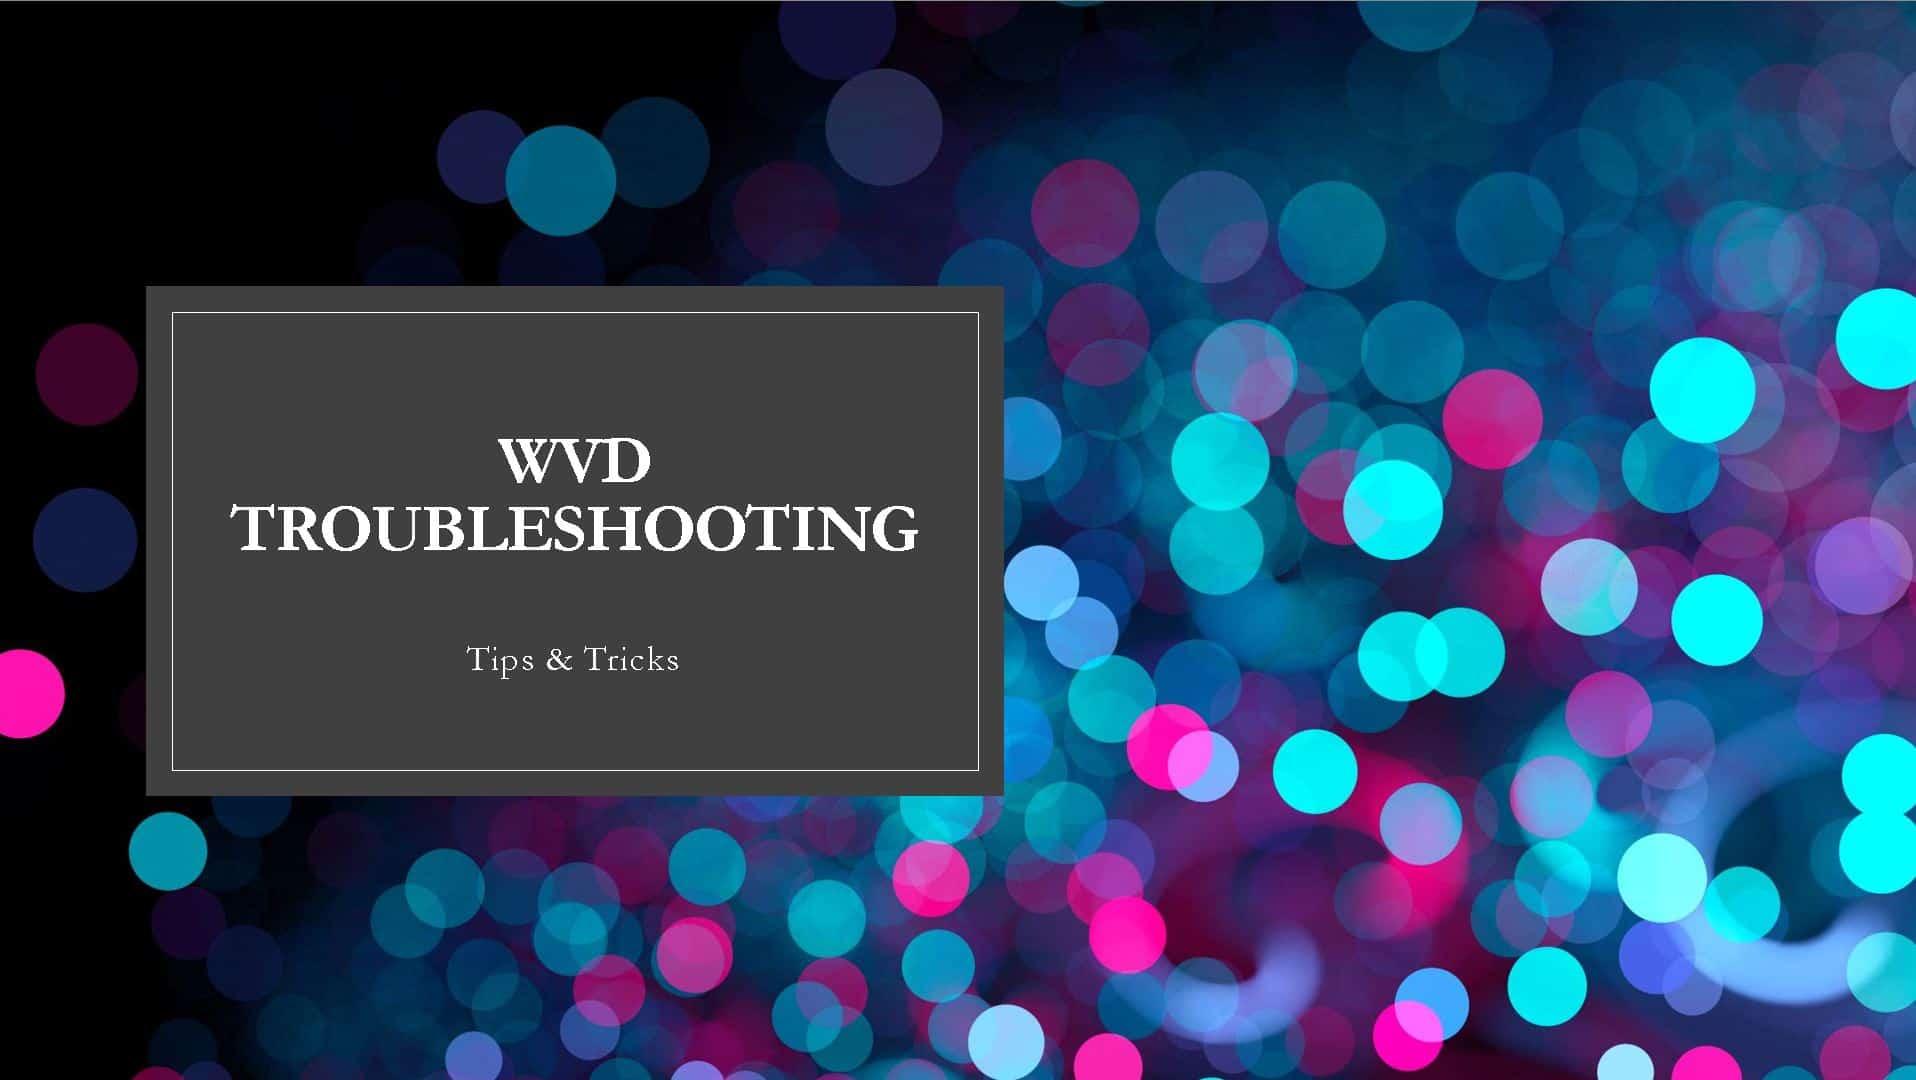 WVD Troubleshooting Tips